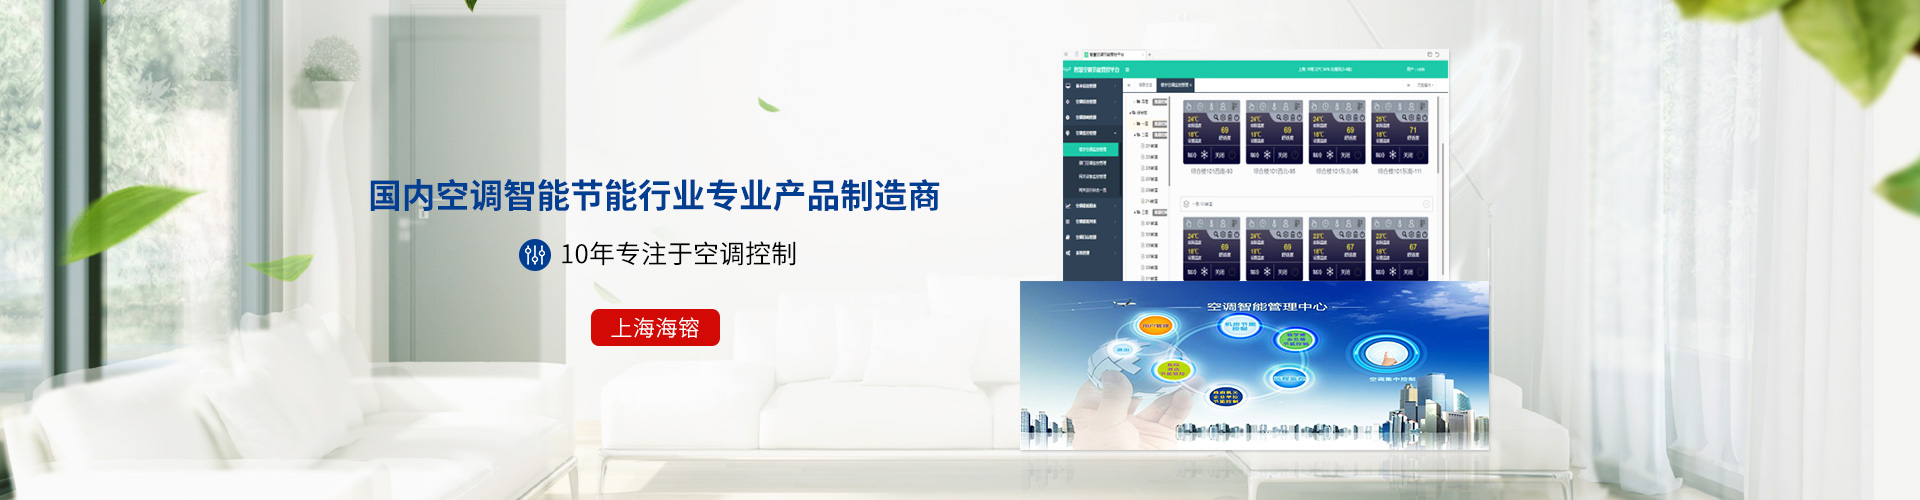 w88winw88优德手机版本登录中文版节能